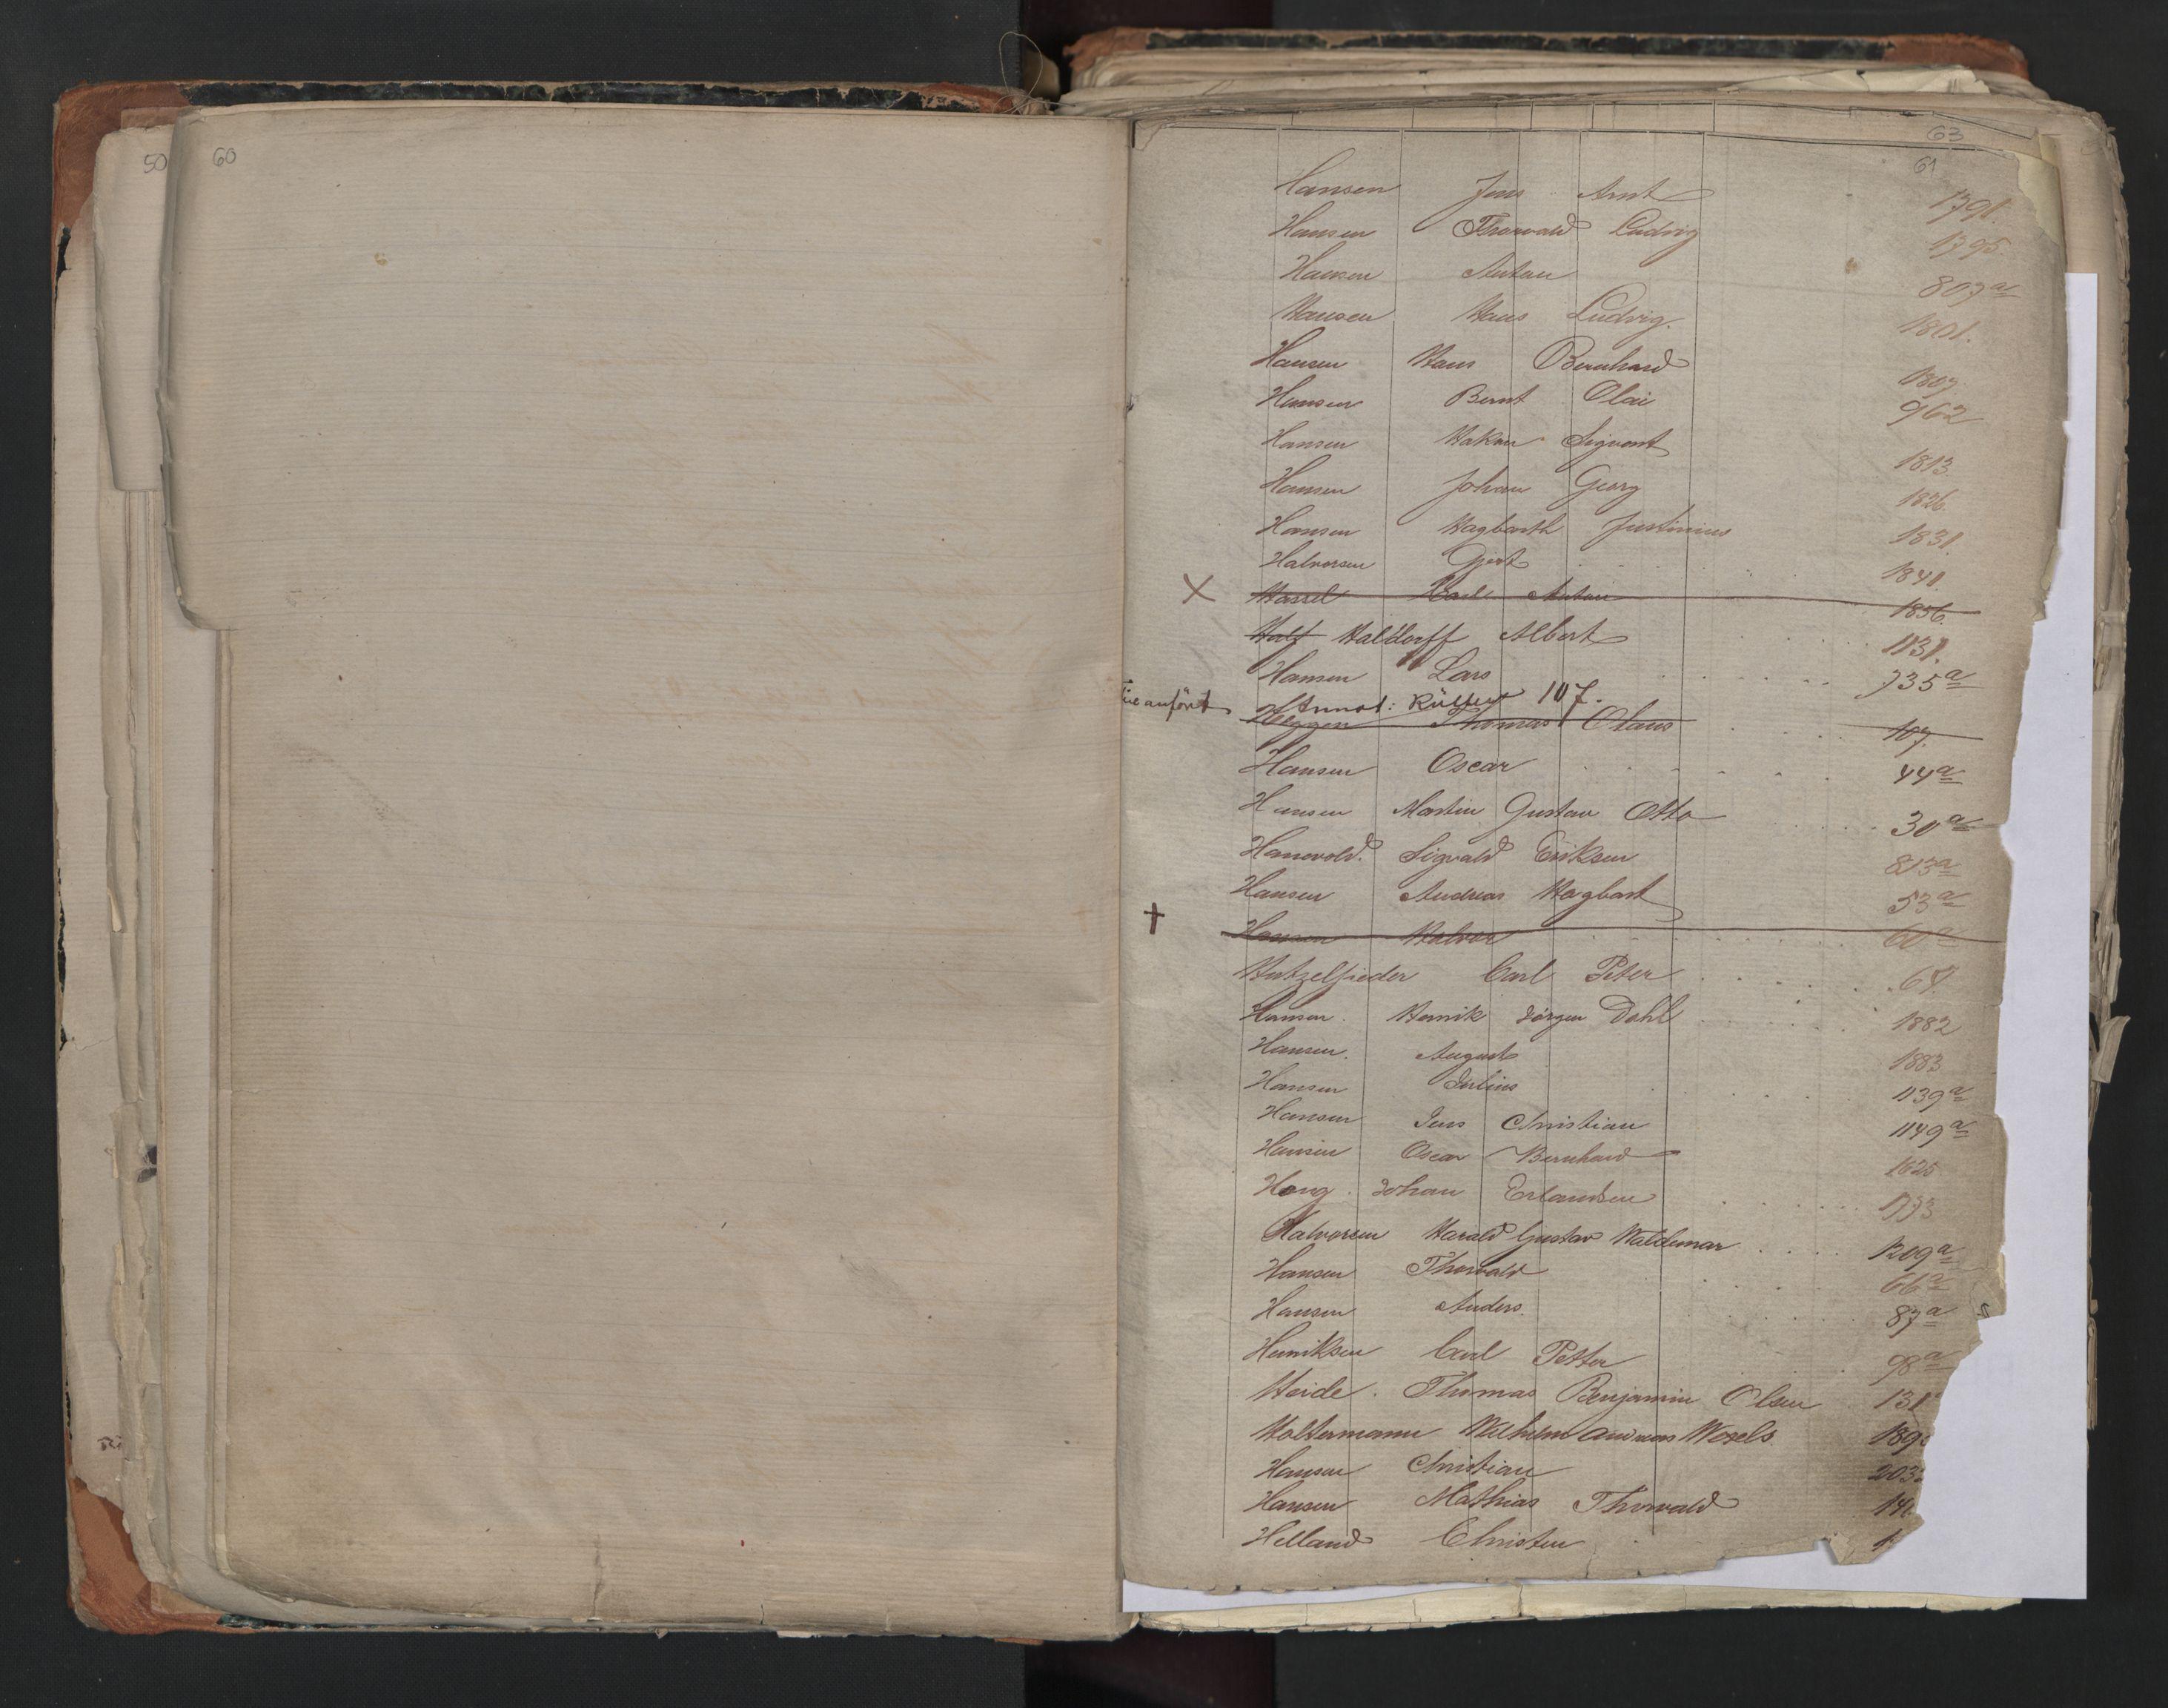 SAO, Oslo sjømannskontor, F/Fa/L0001: Register for Kristiania krets, 1866-1891, s. 60-61